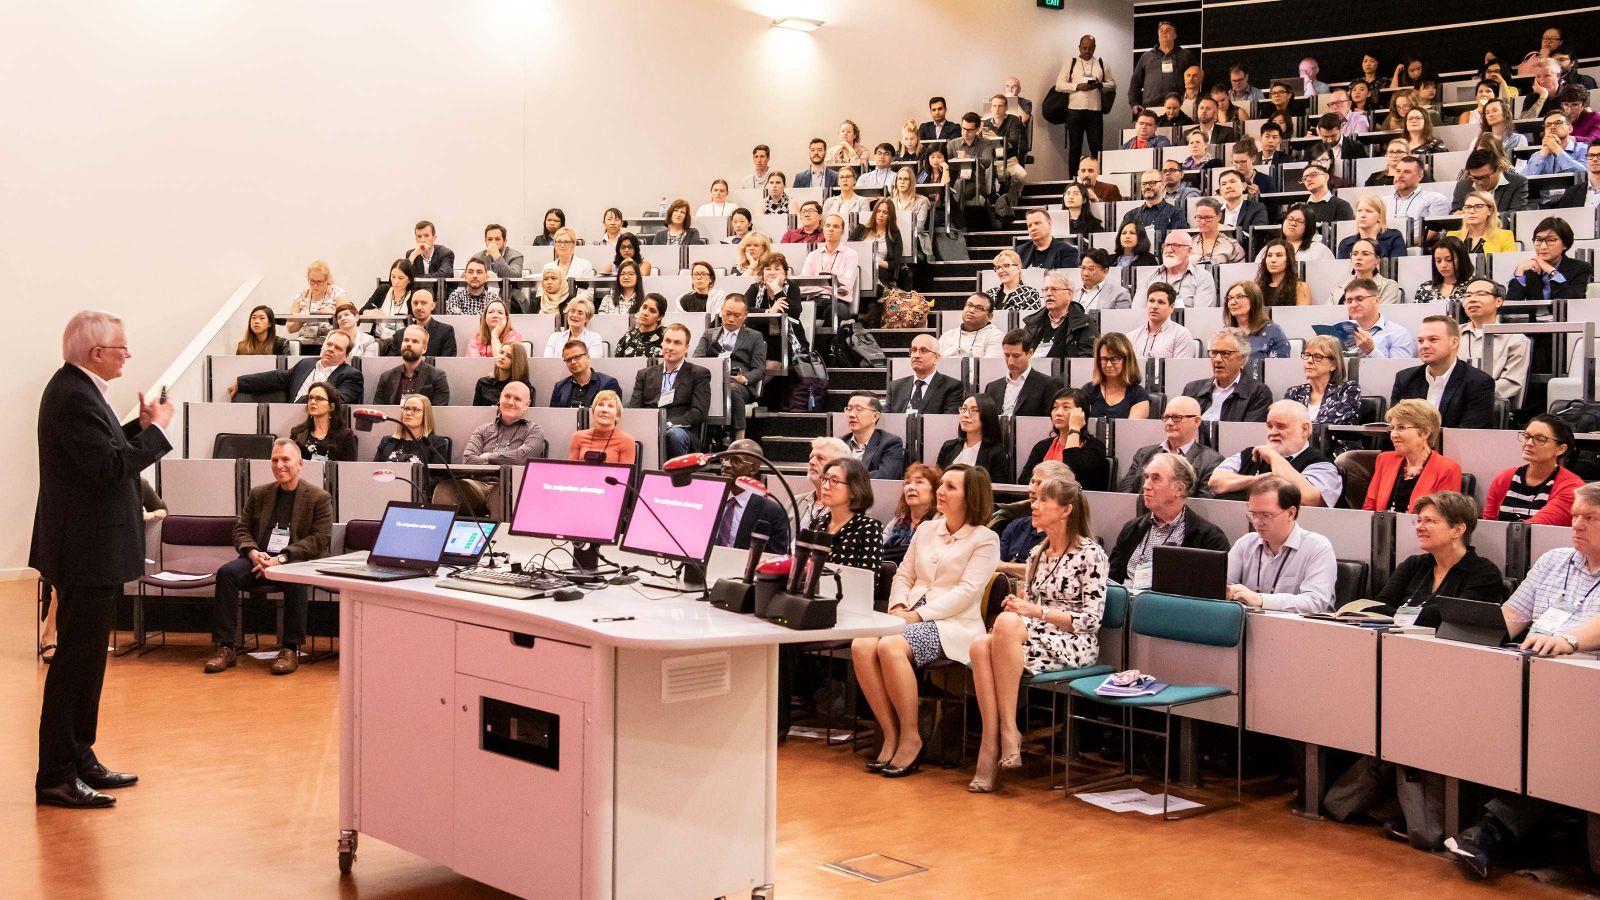 Professor John Deighton hosts a presentation at the ANZMAC conference